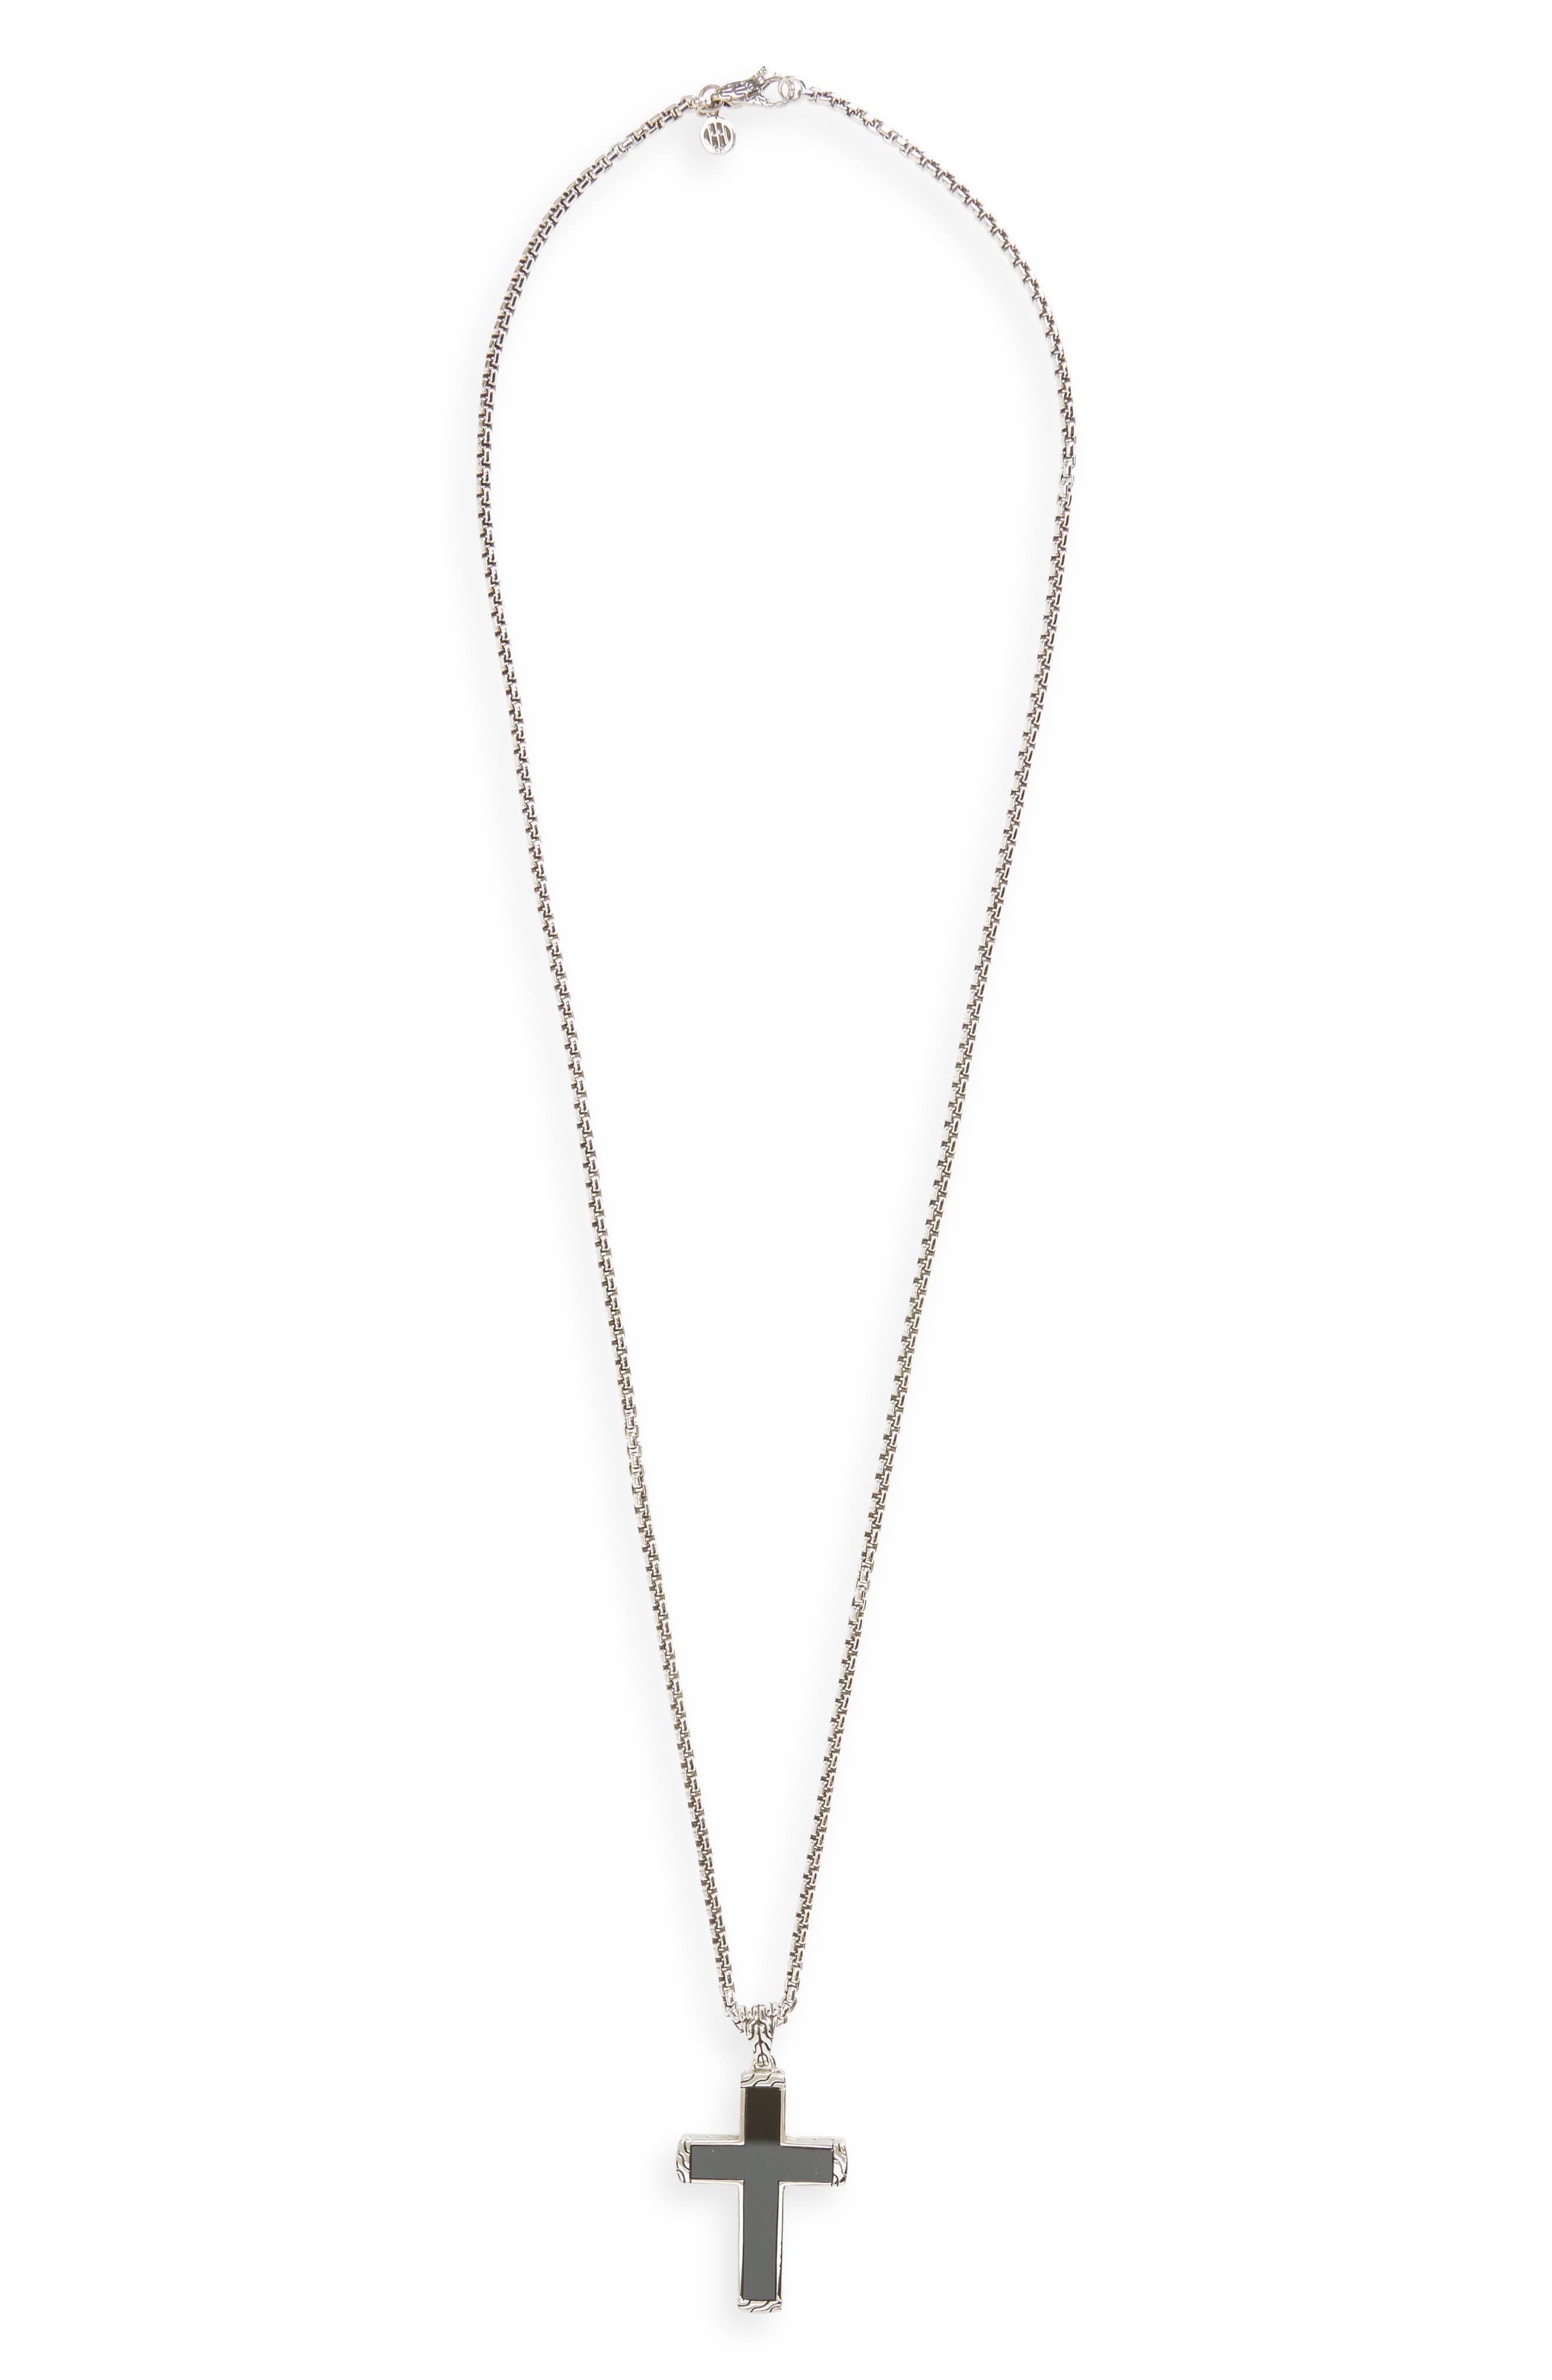 Classic Chain Cross Pendant Necklace,                             Main thumbnail 1, color,                             SILVER/ BLACK JADE